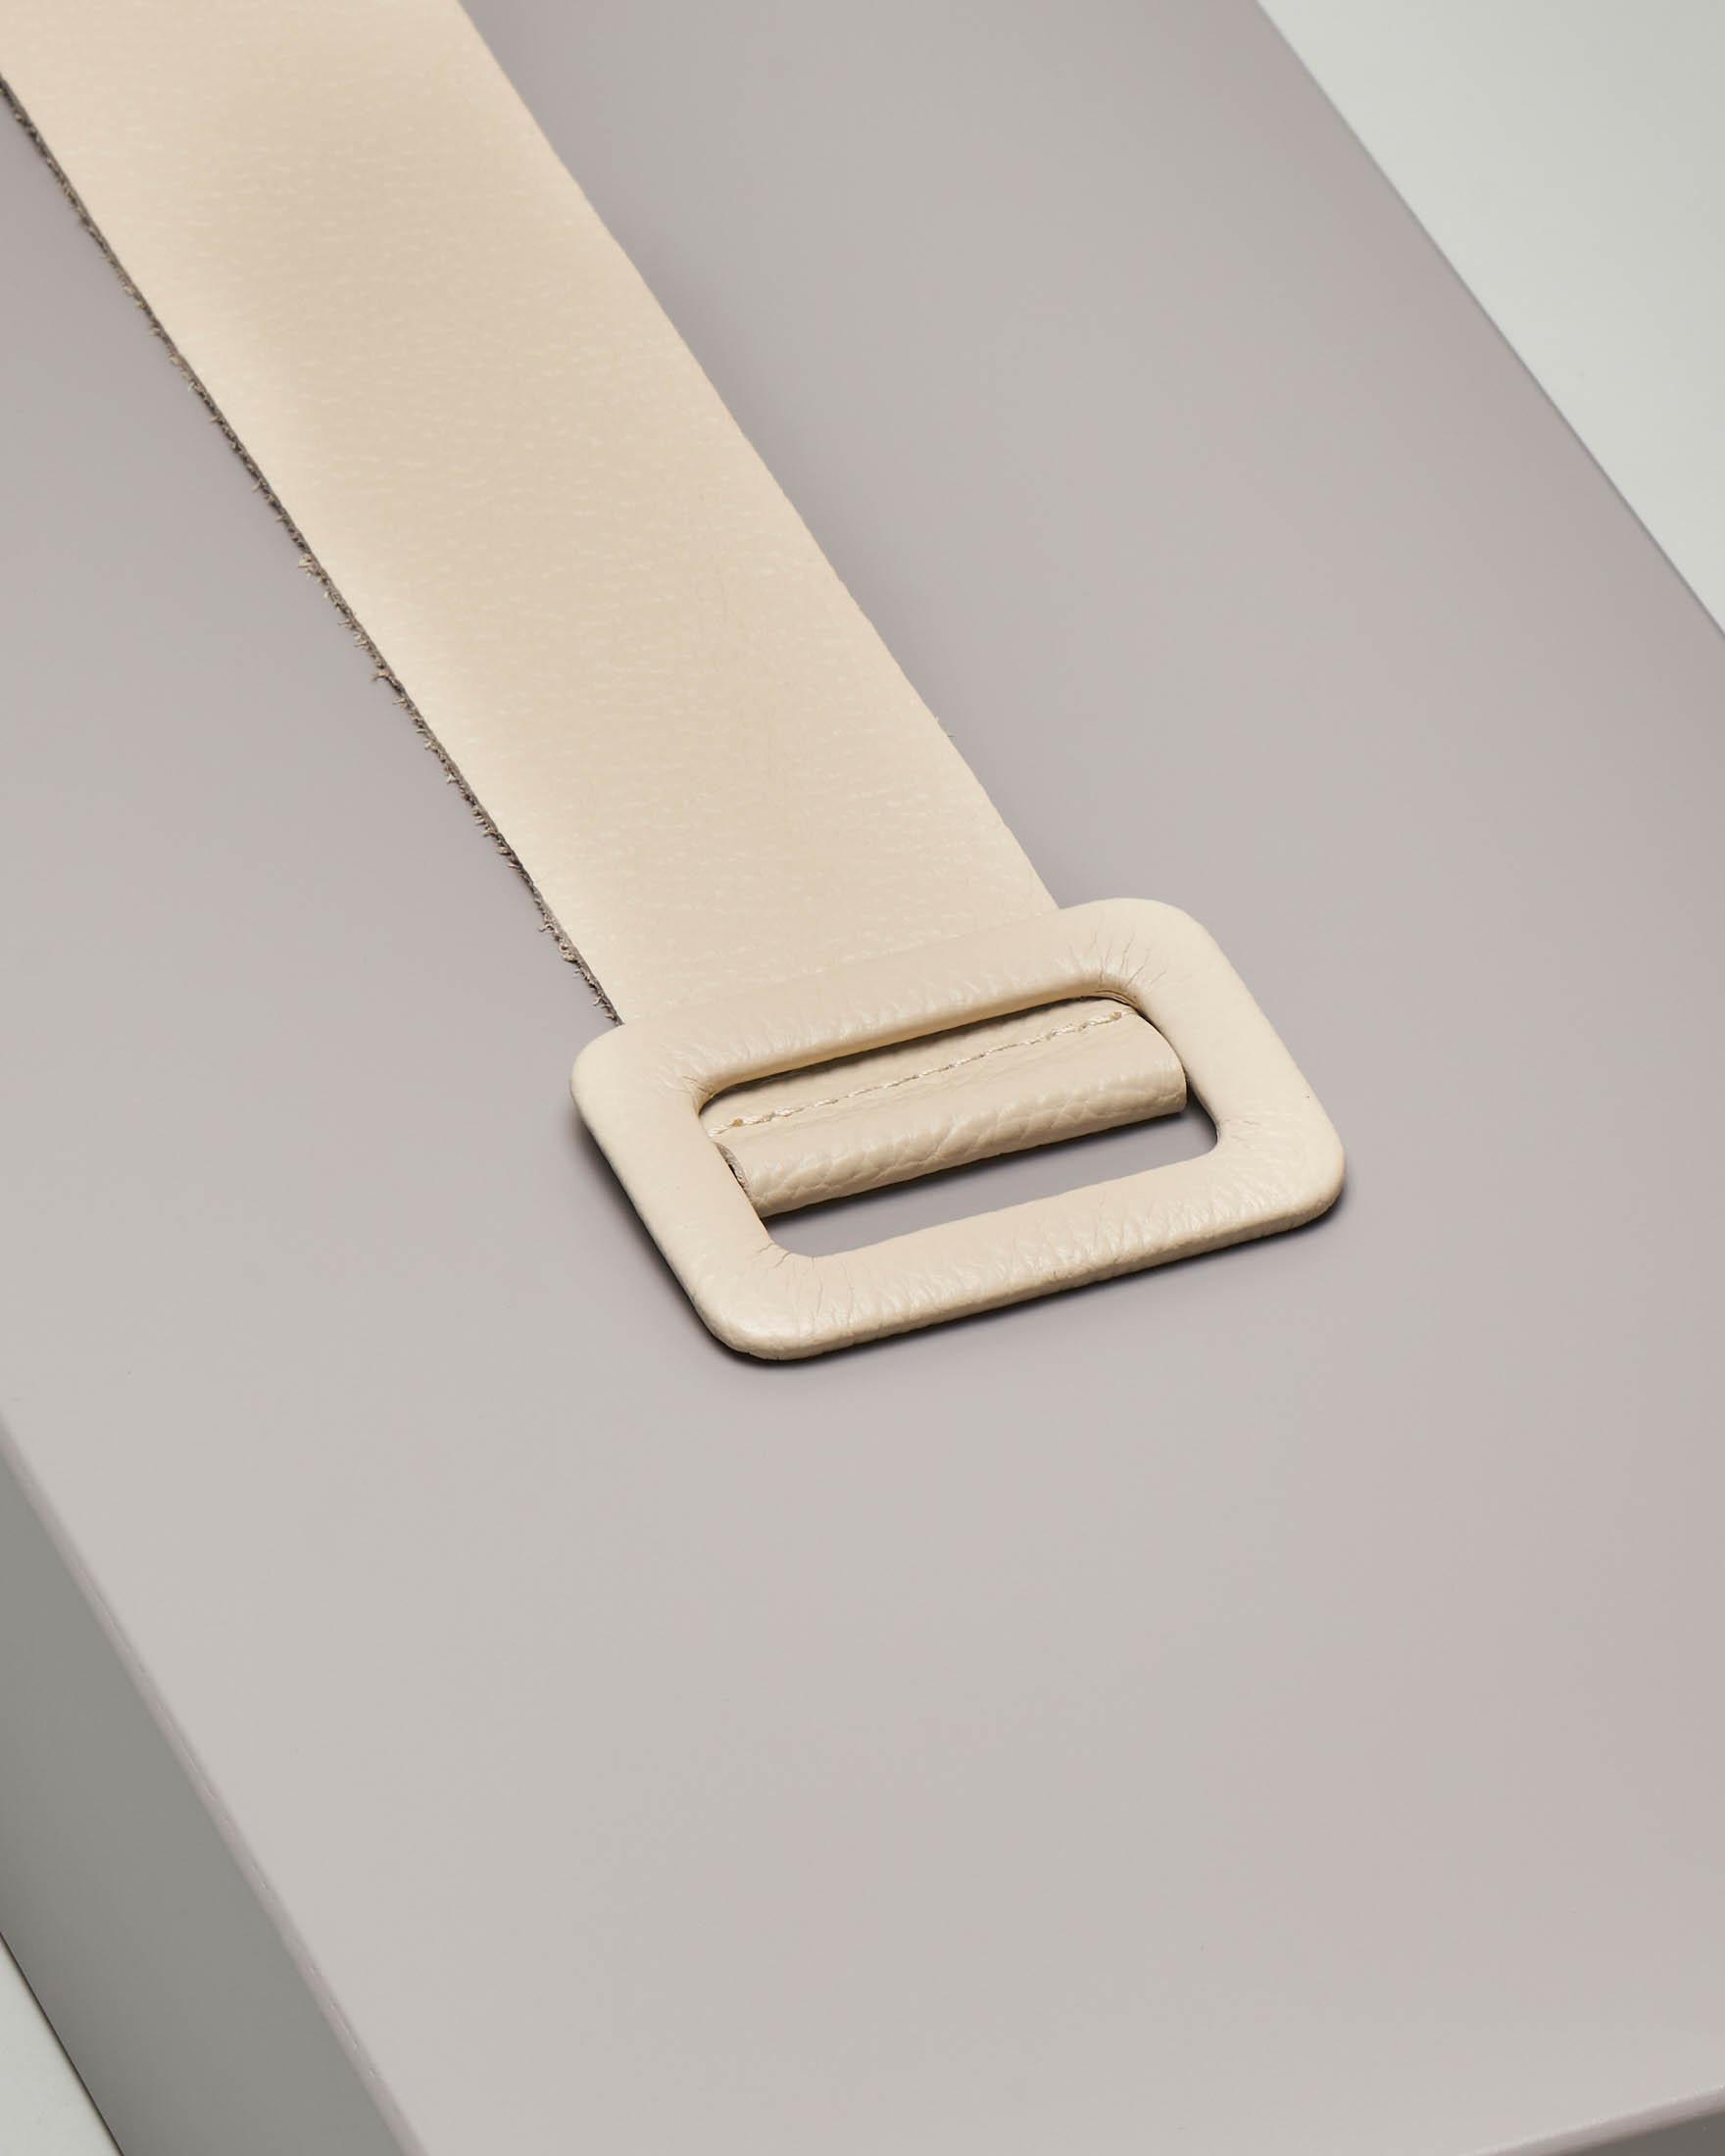 Cintura in pelle liscia color panna con fibbia tono su tono